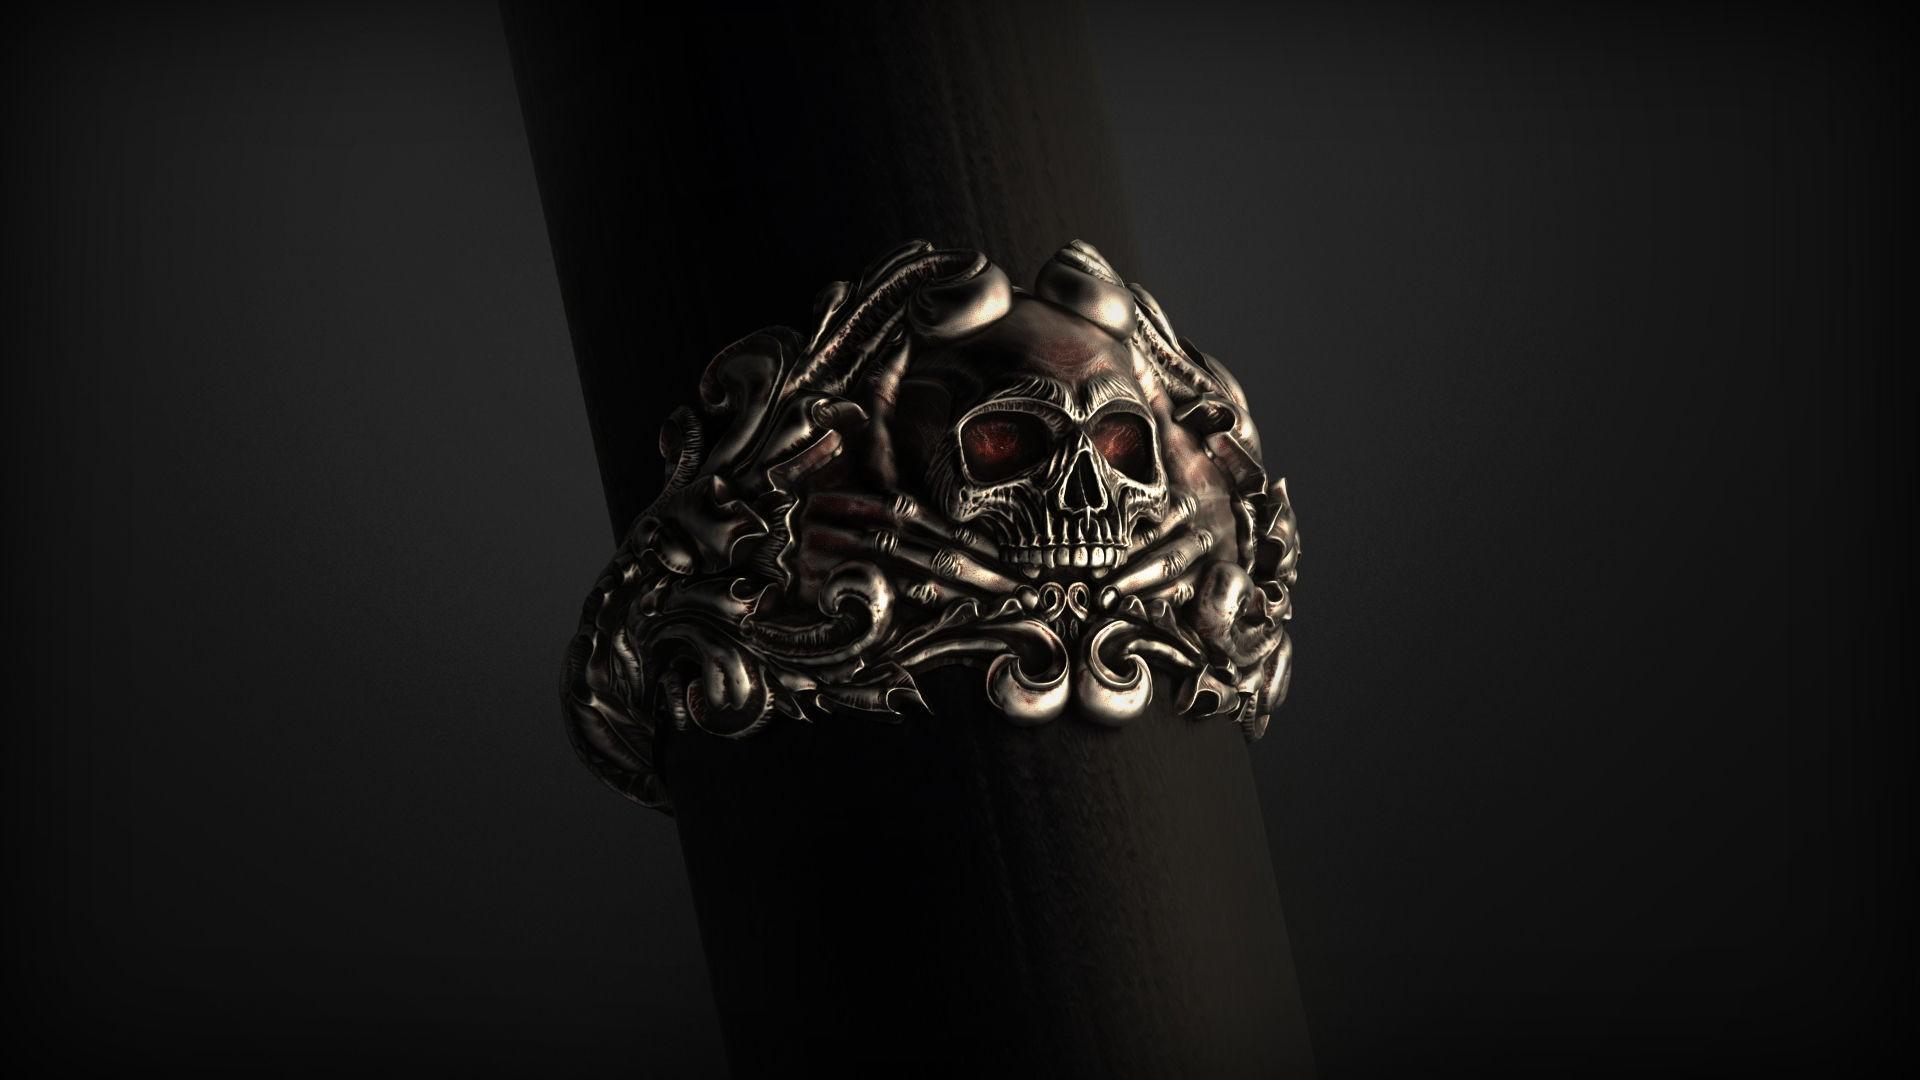 vintage-skull-ring-3d-model-for-3d-printing-3d-model-obj-stl (4).jpg Download OBJ file Vintage Ring • 3D print template, Roman_Kharikov